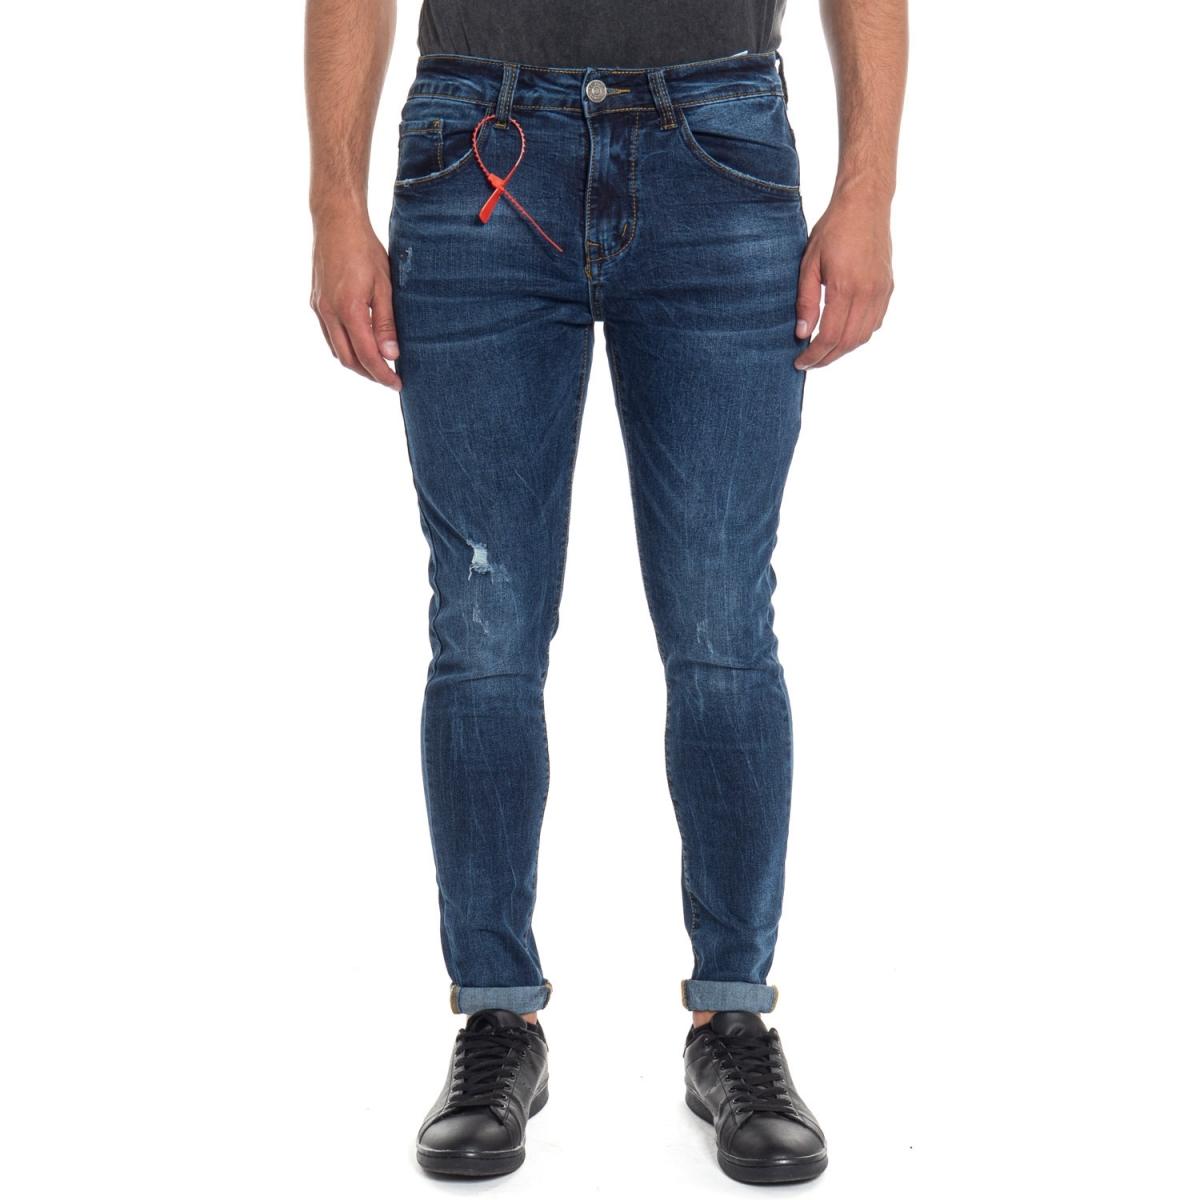 abbigliamento Jeans uomo Jeans Skinny Fit LPM2202 LANDEK PARK Cafedelmar Shop